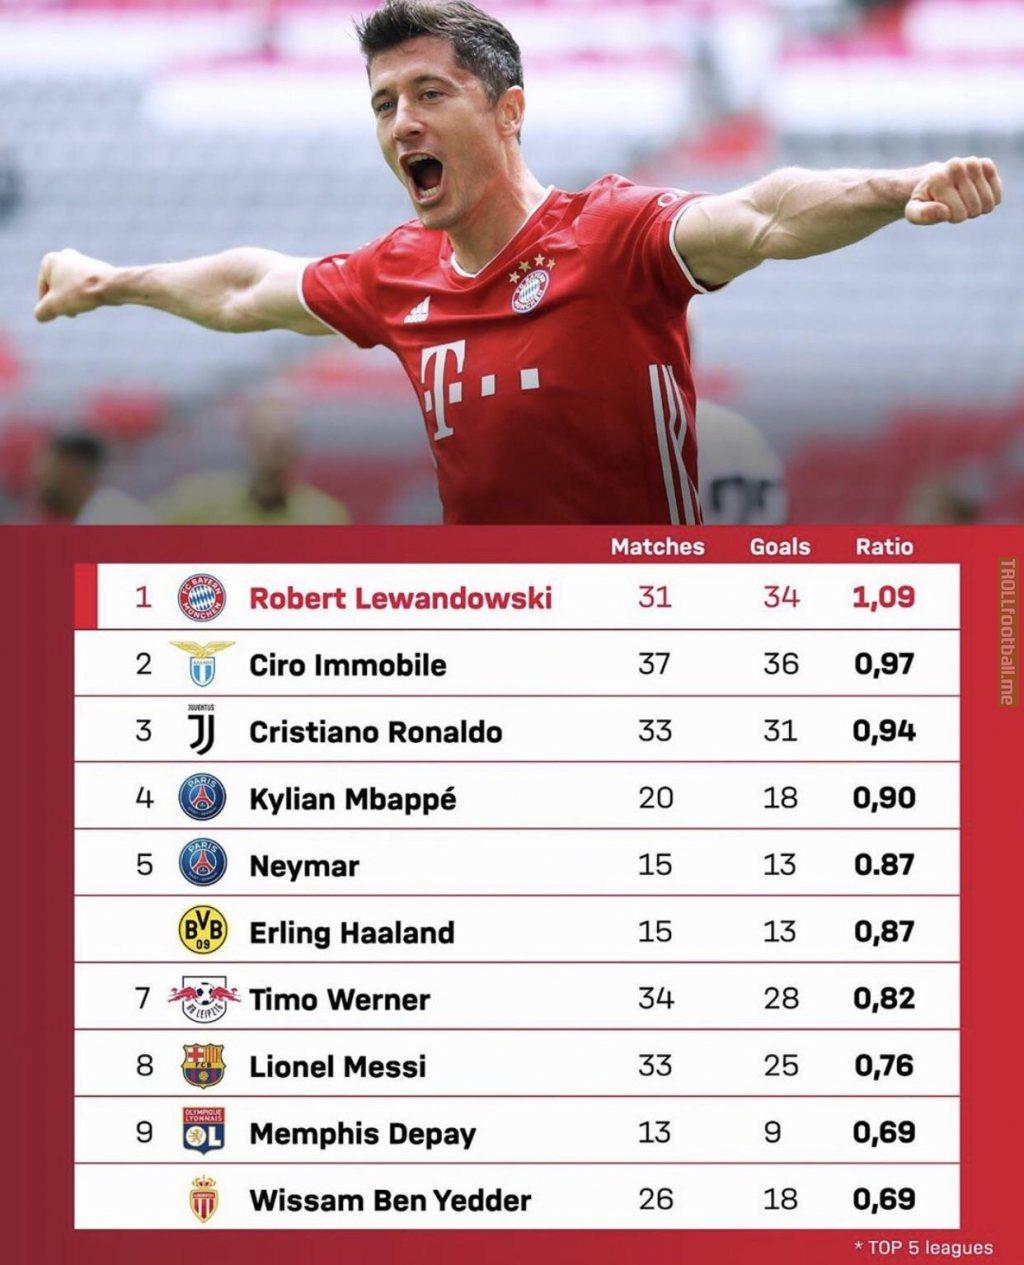 Lewandowski has the highest scoring ratio in the top 5 leagues in Europe